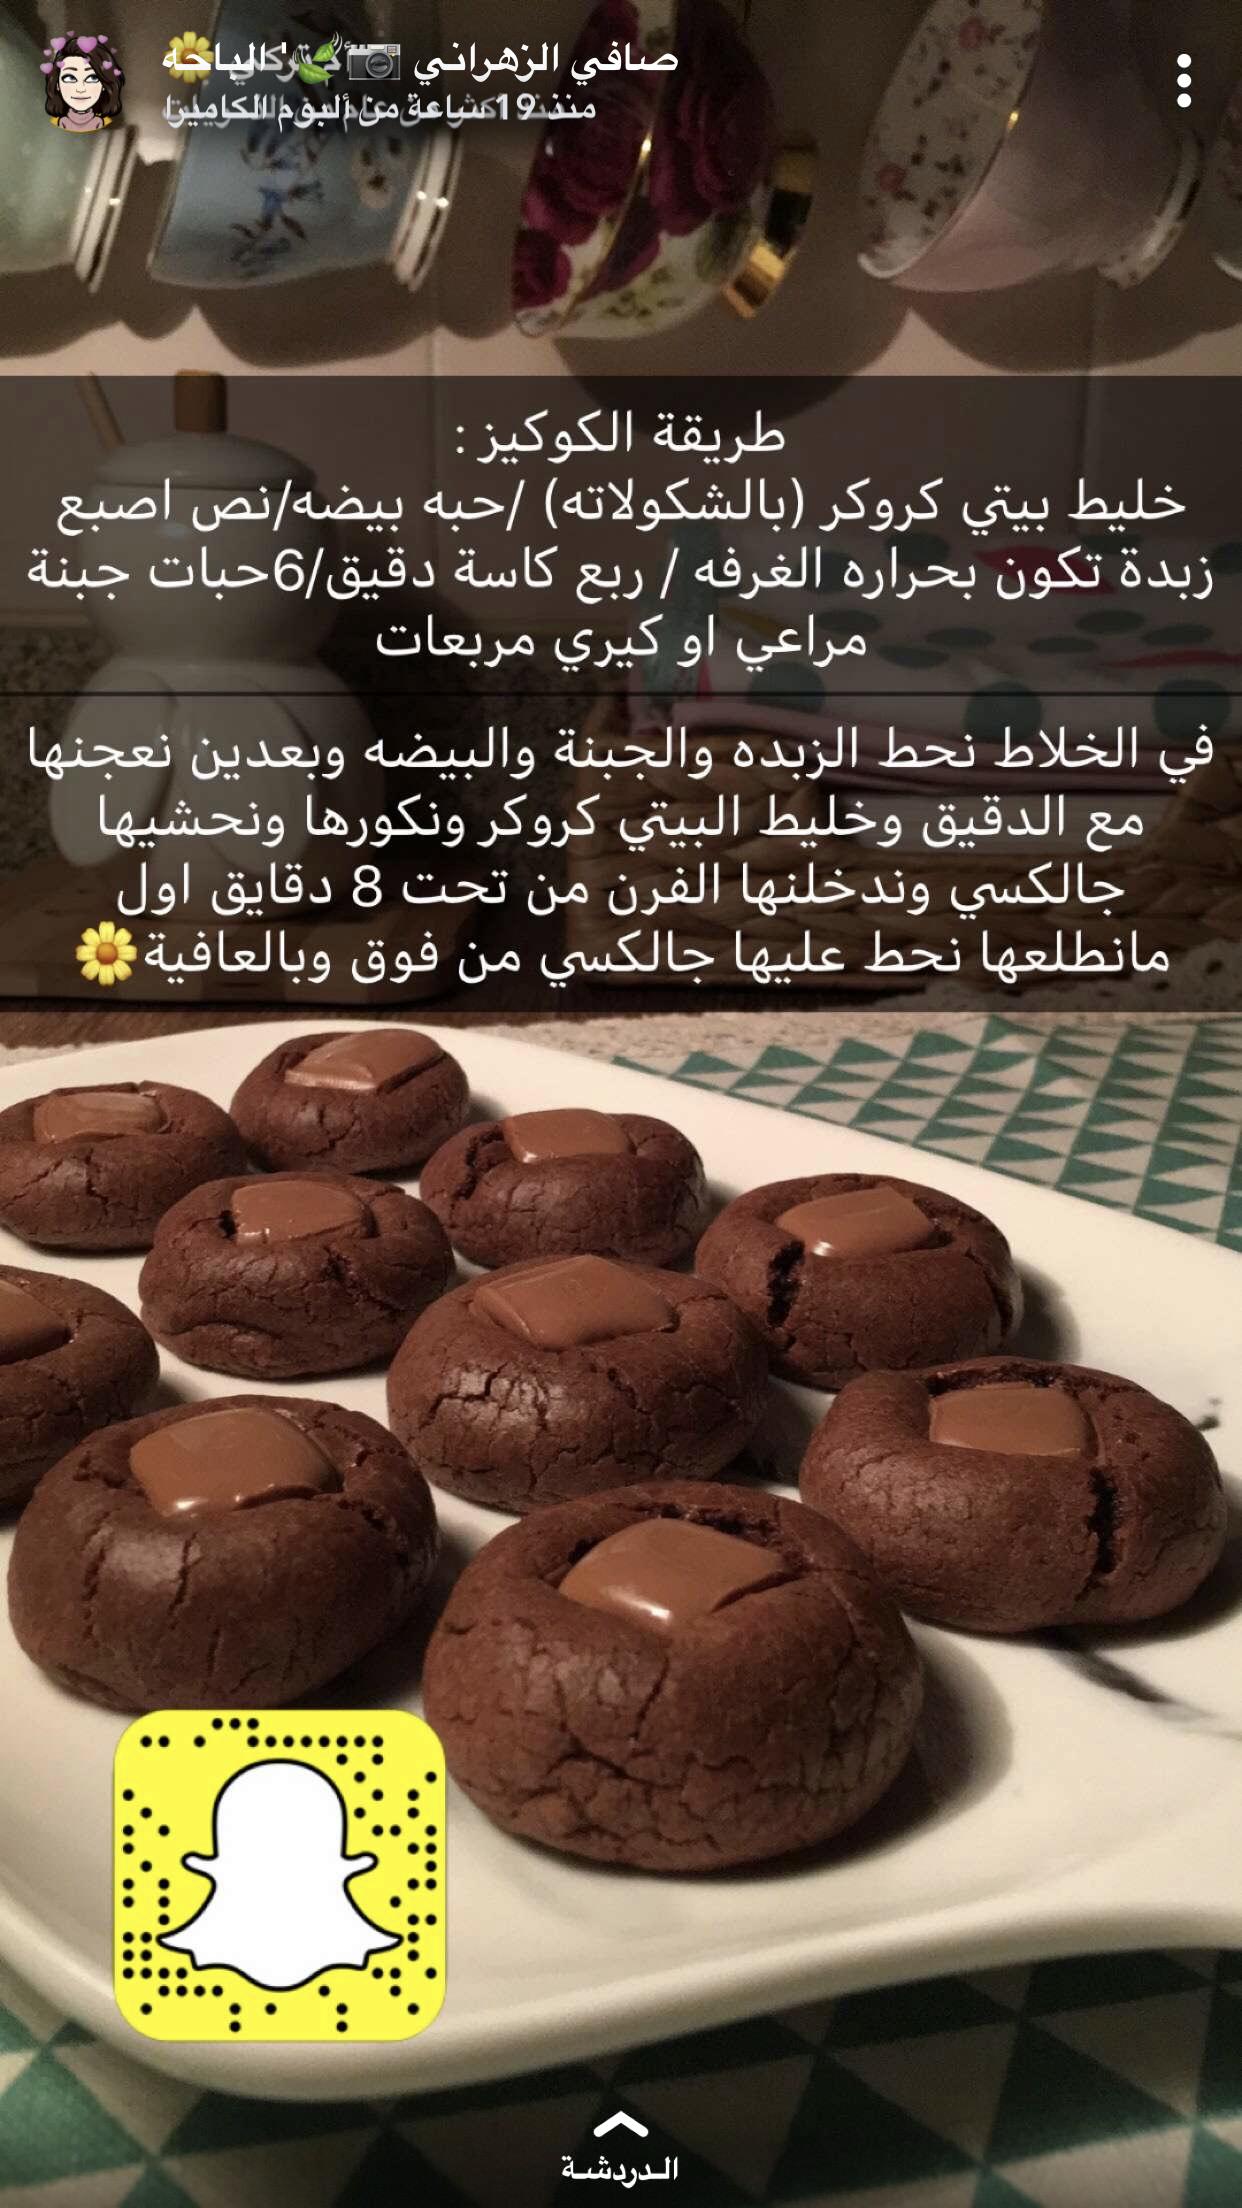 Pin By Hanan Abdelhalim On Food Yummy Food Dessert Food Drinks Dessert Dessert Ingredients